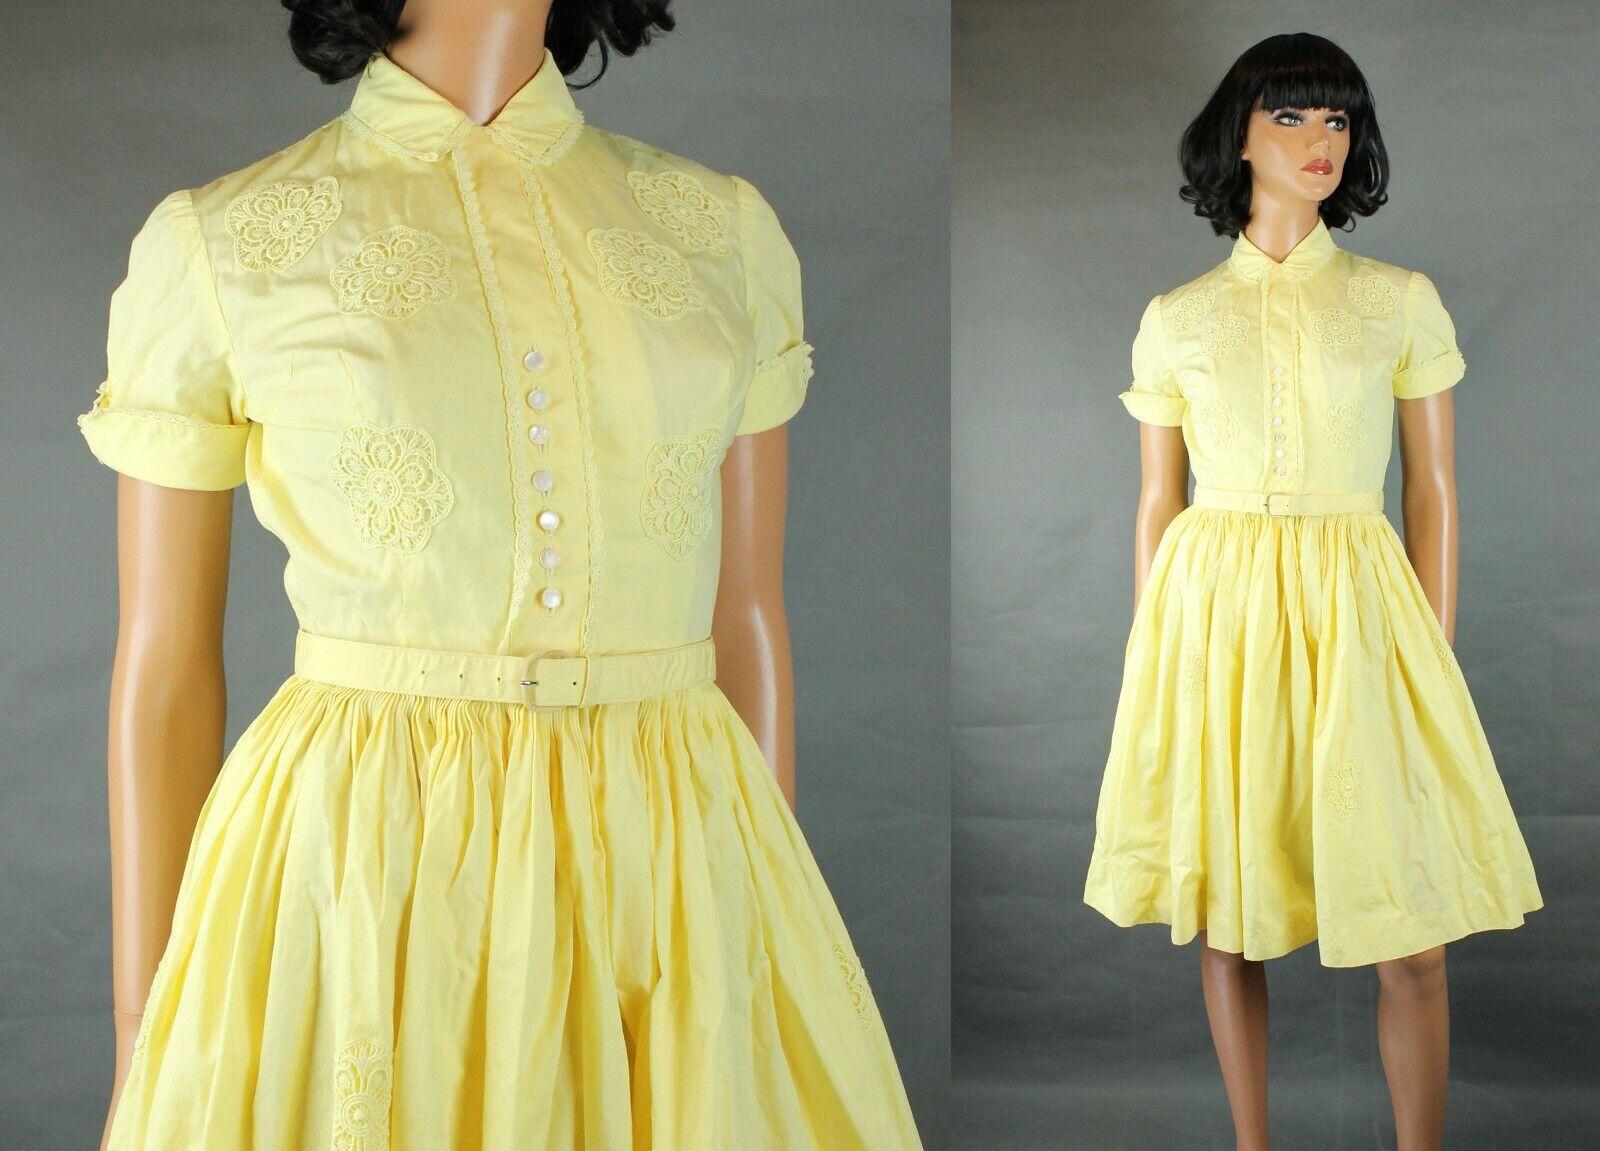 50s Party Gown Sz XS Vintage Butter Yellow Cotton Lace Flowers Shirt Dress